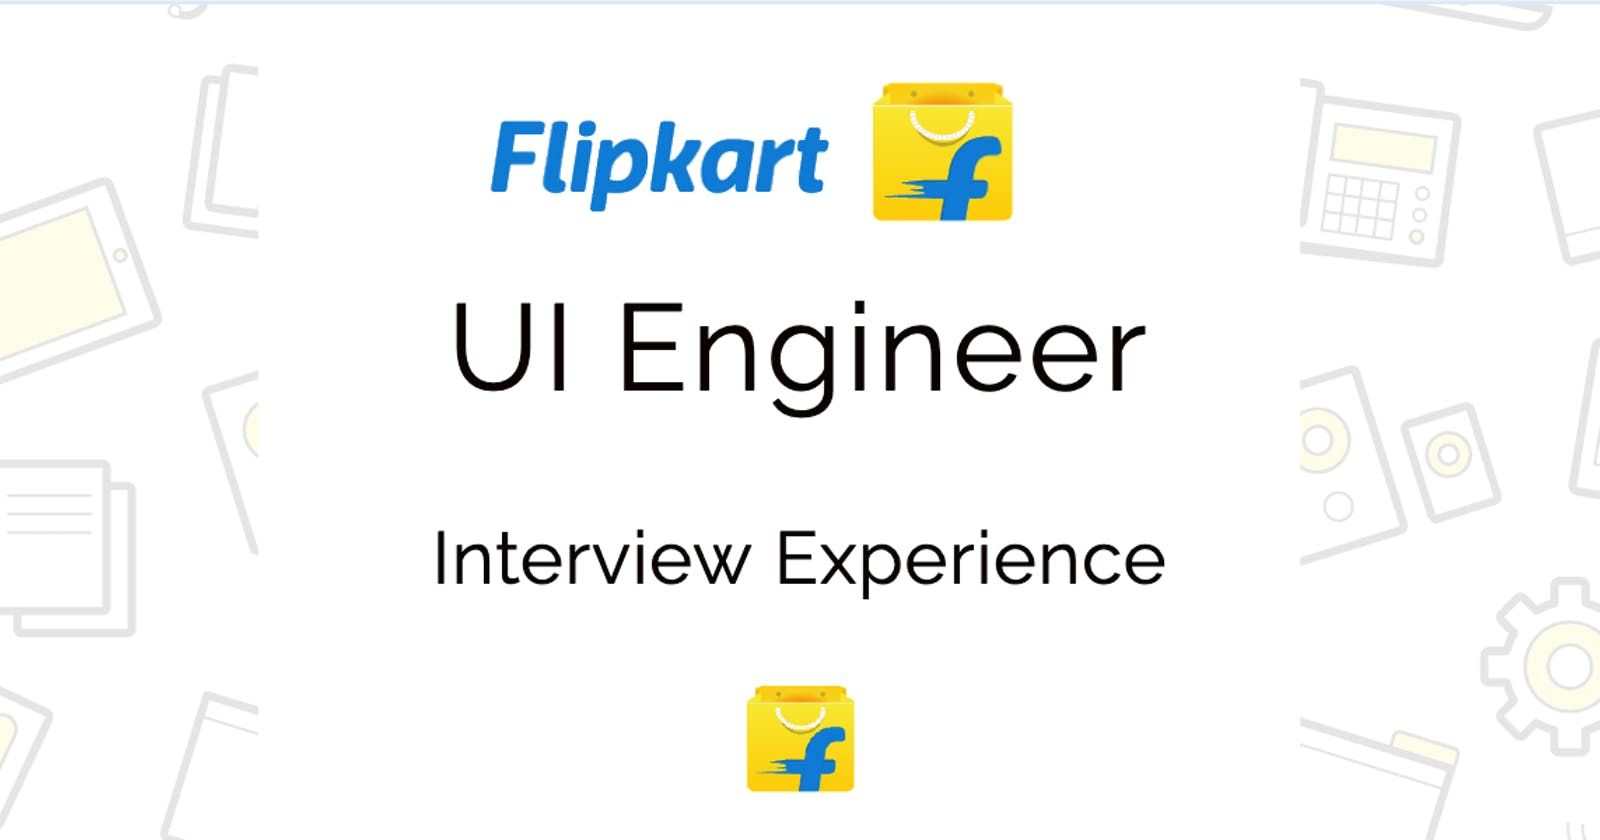 Flipkart UI Engineer 1 interview - My experience